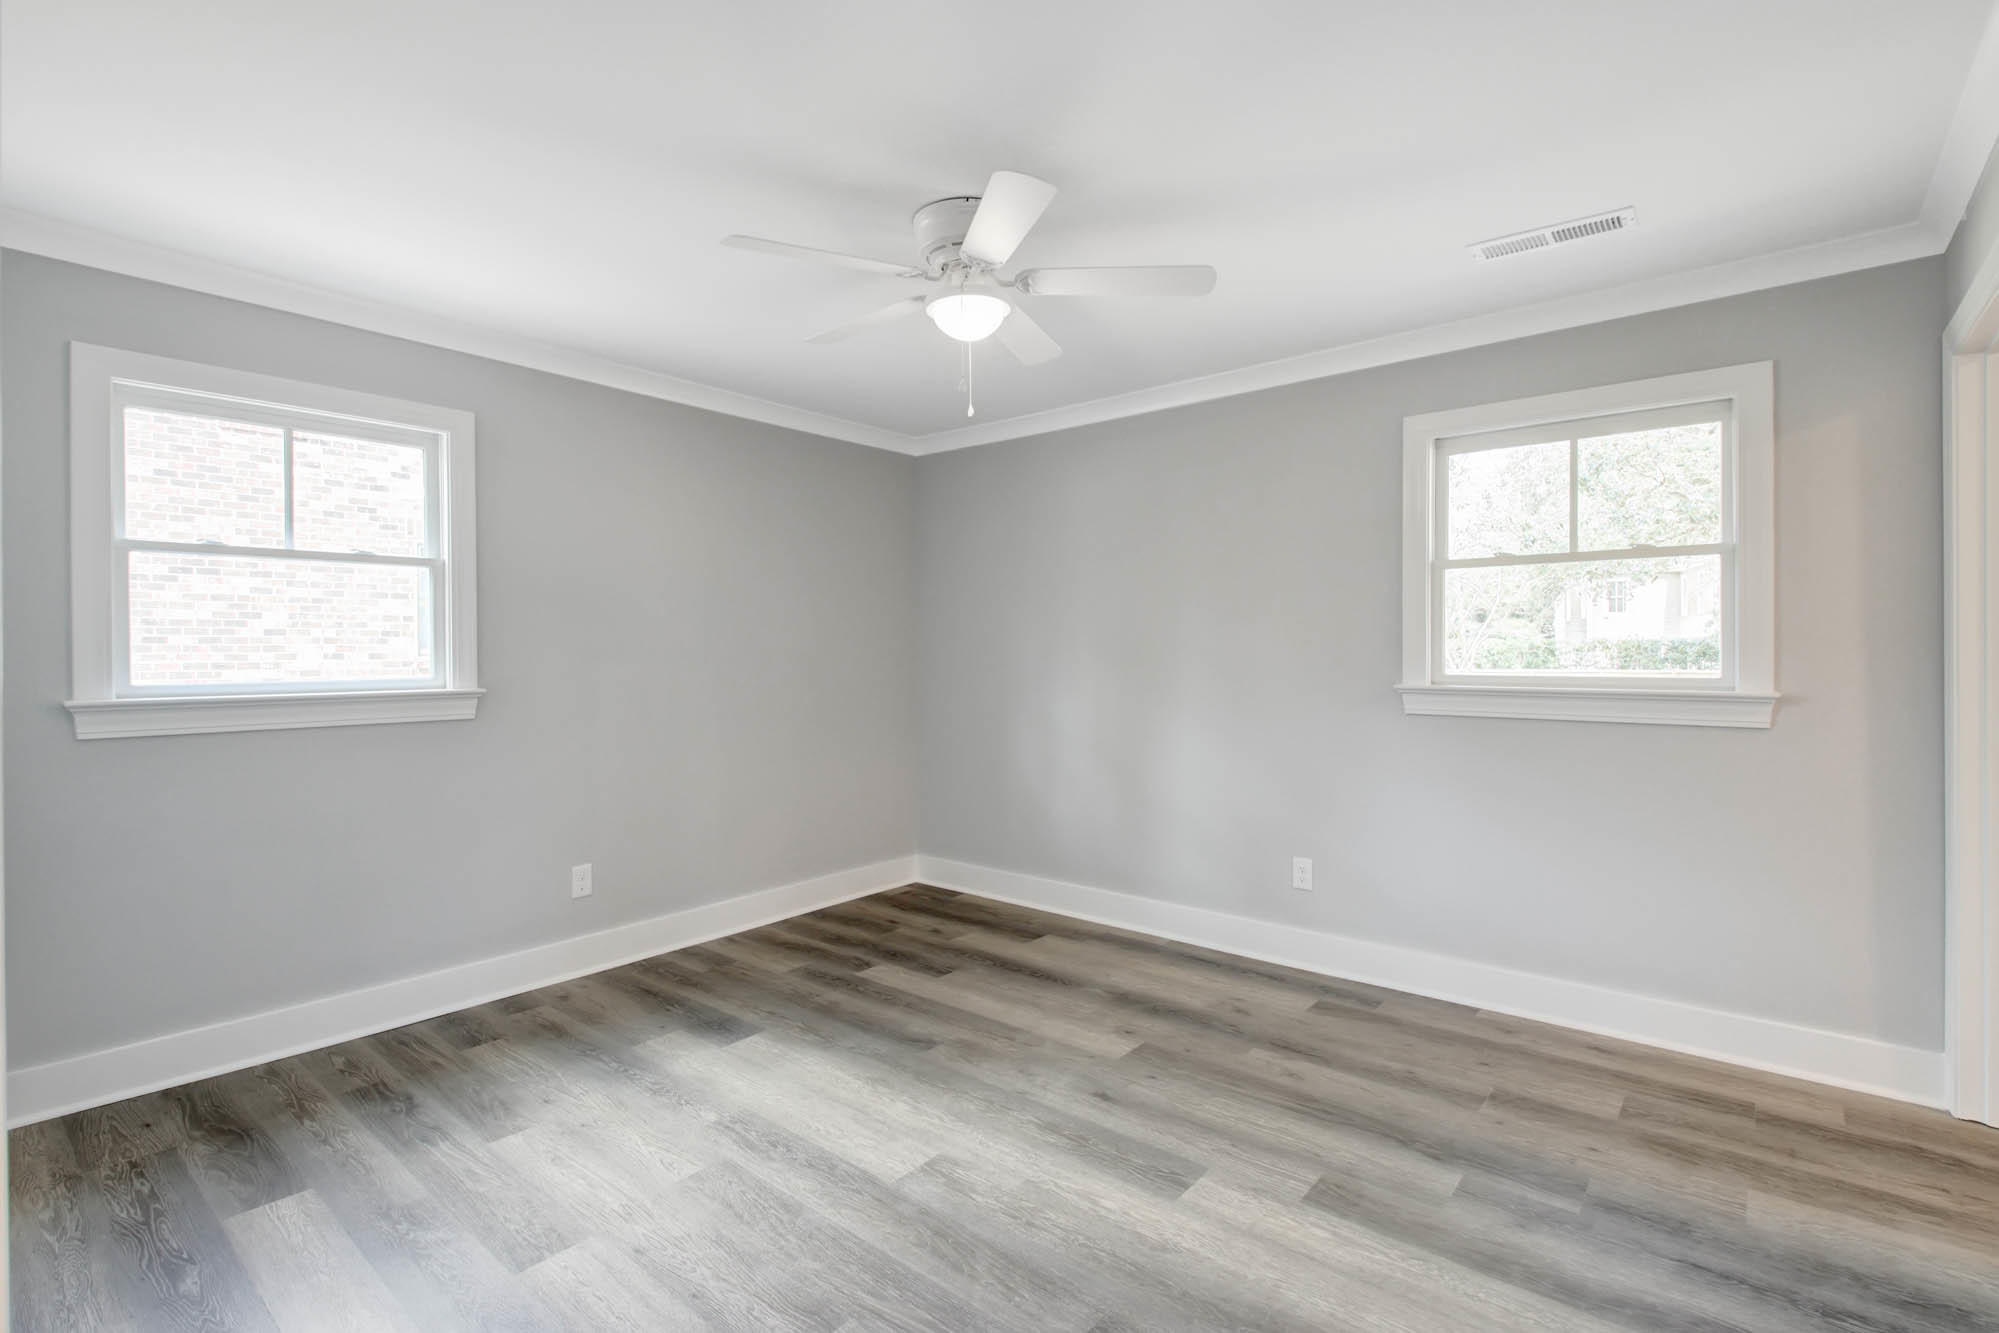 Scanlonville Homes For Sale - 344 4th, Mount Pleasant, SC - 34